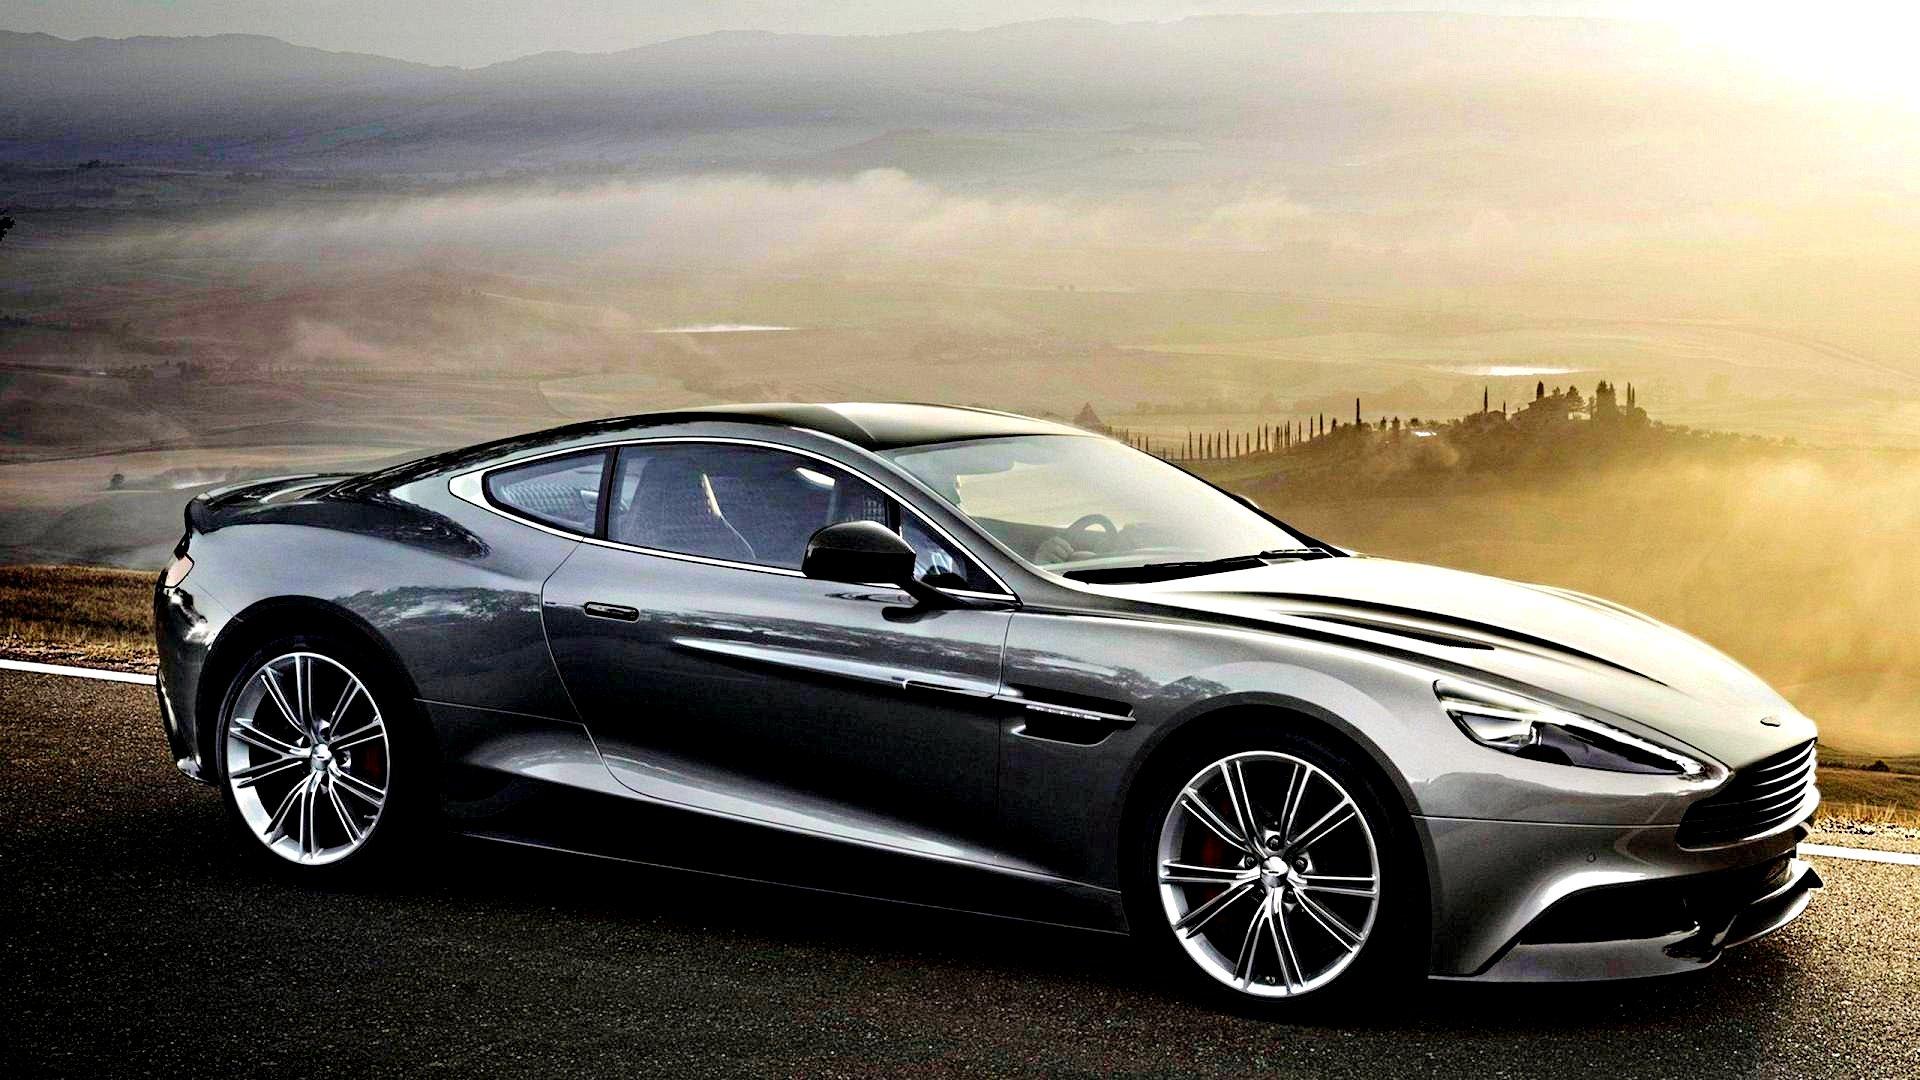 Aston Martin Vanquish Fondo De Pantalla Hd Fondo De